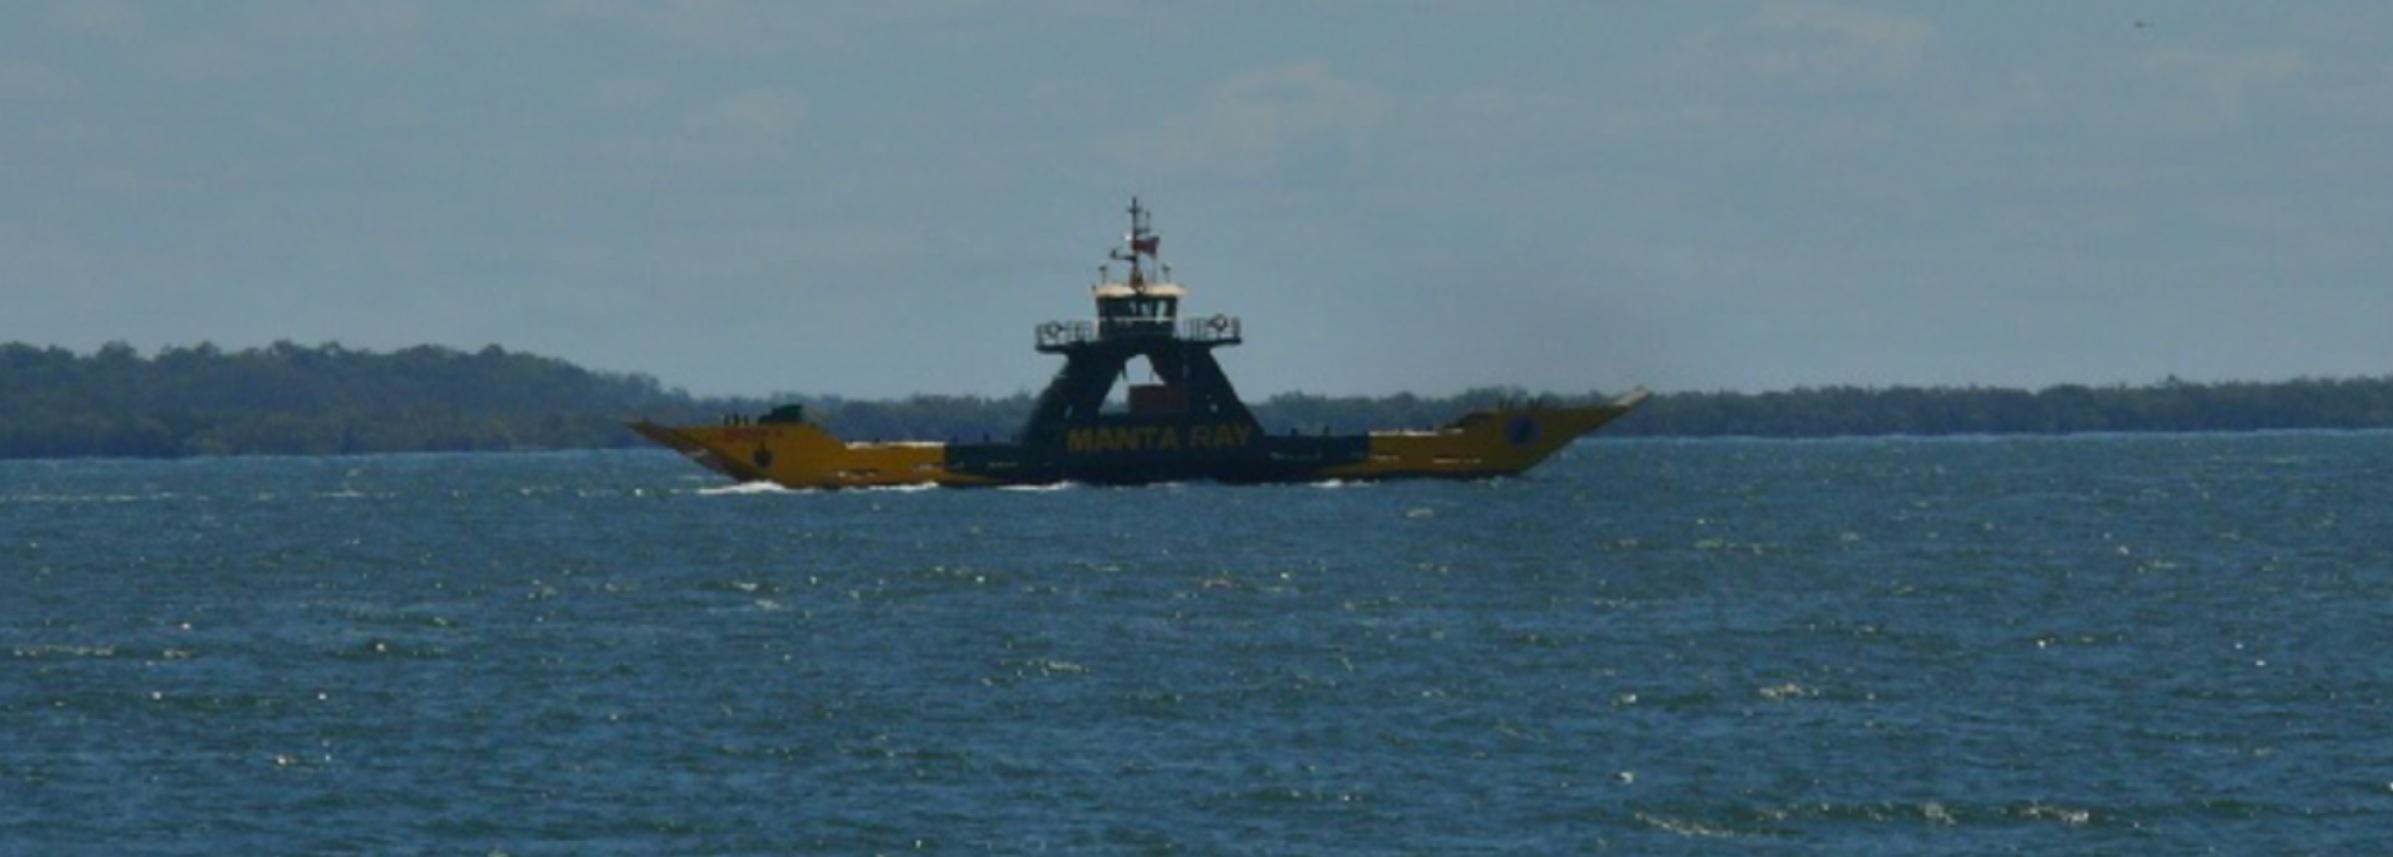 Walk On Barge To Fraser Island